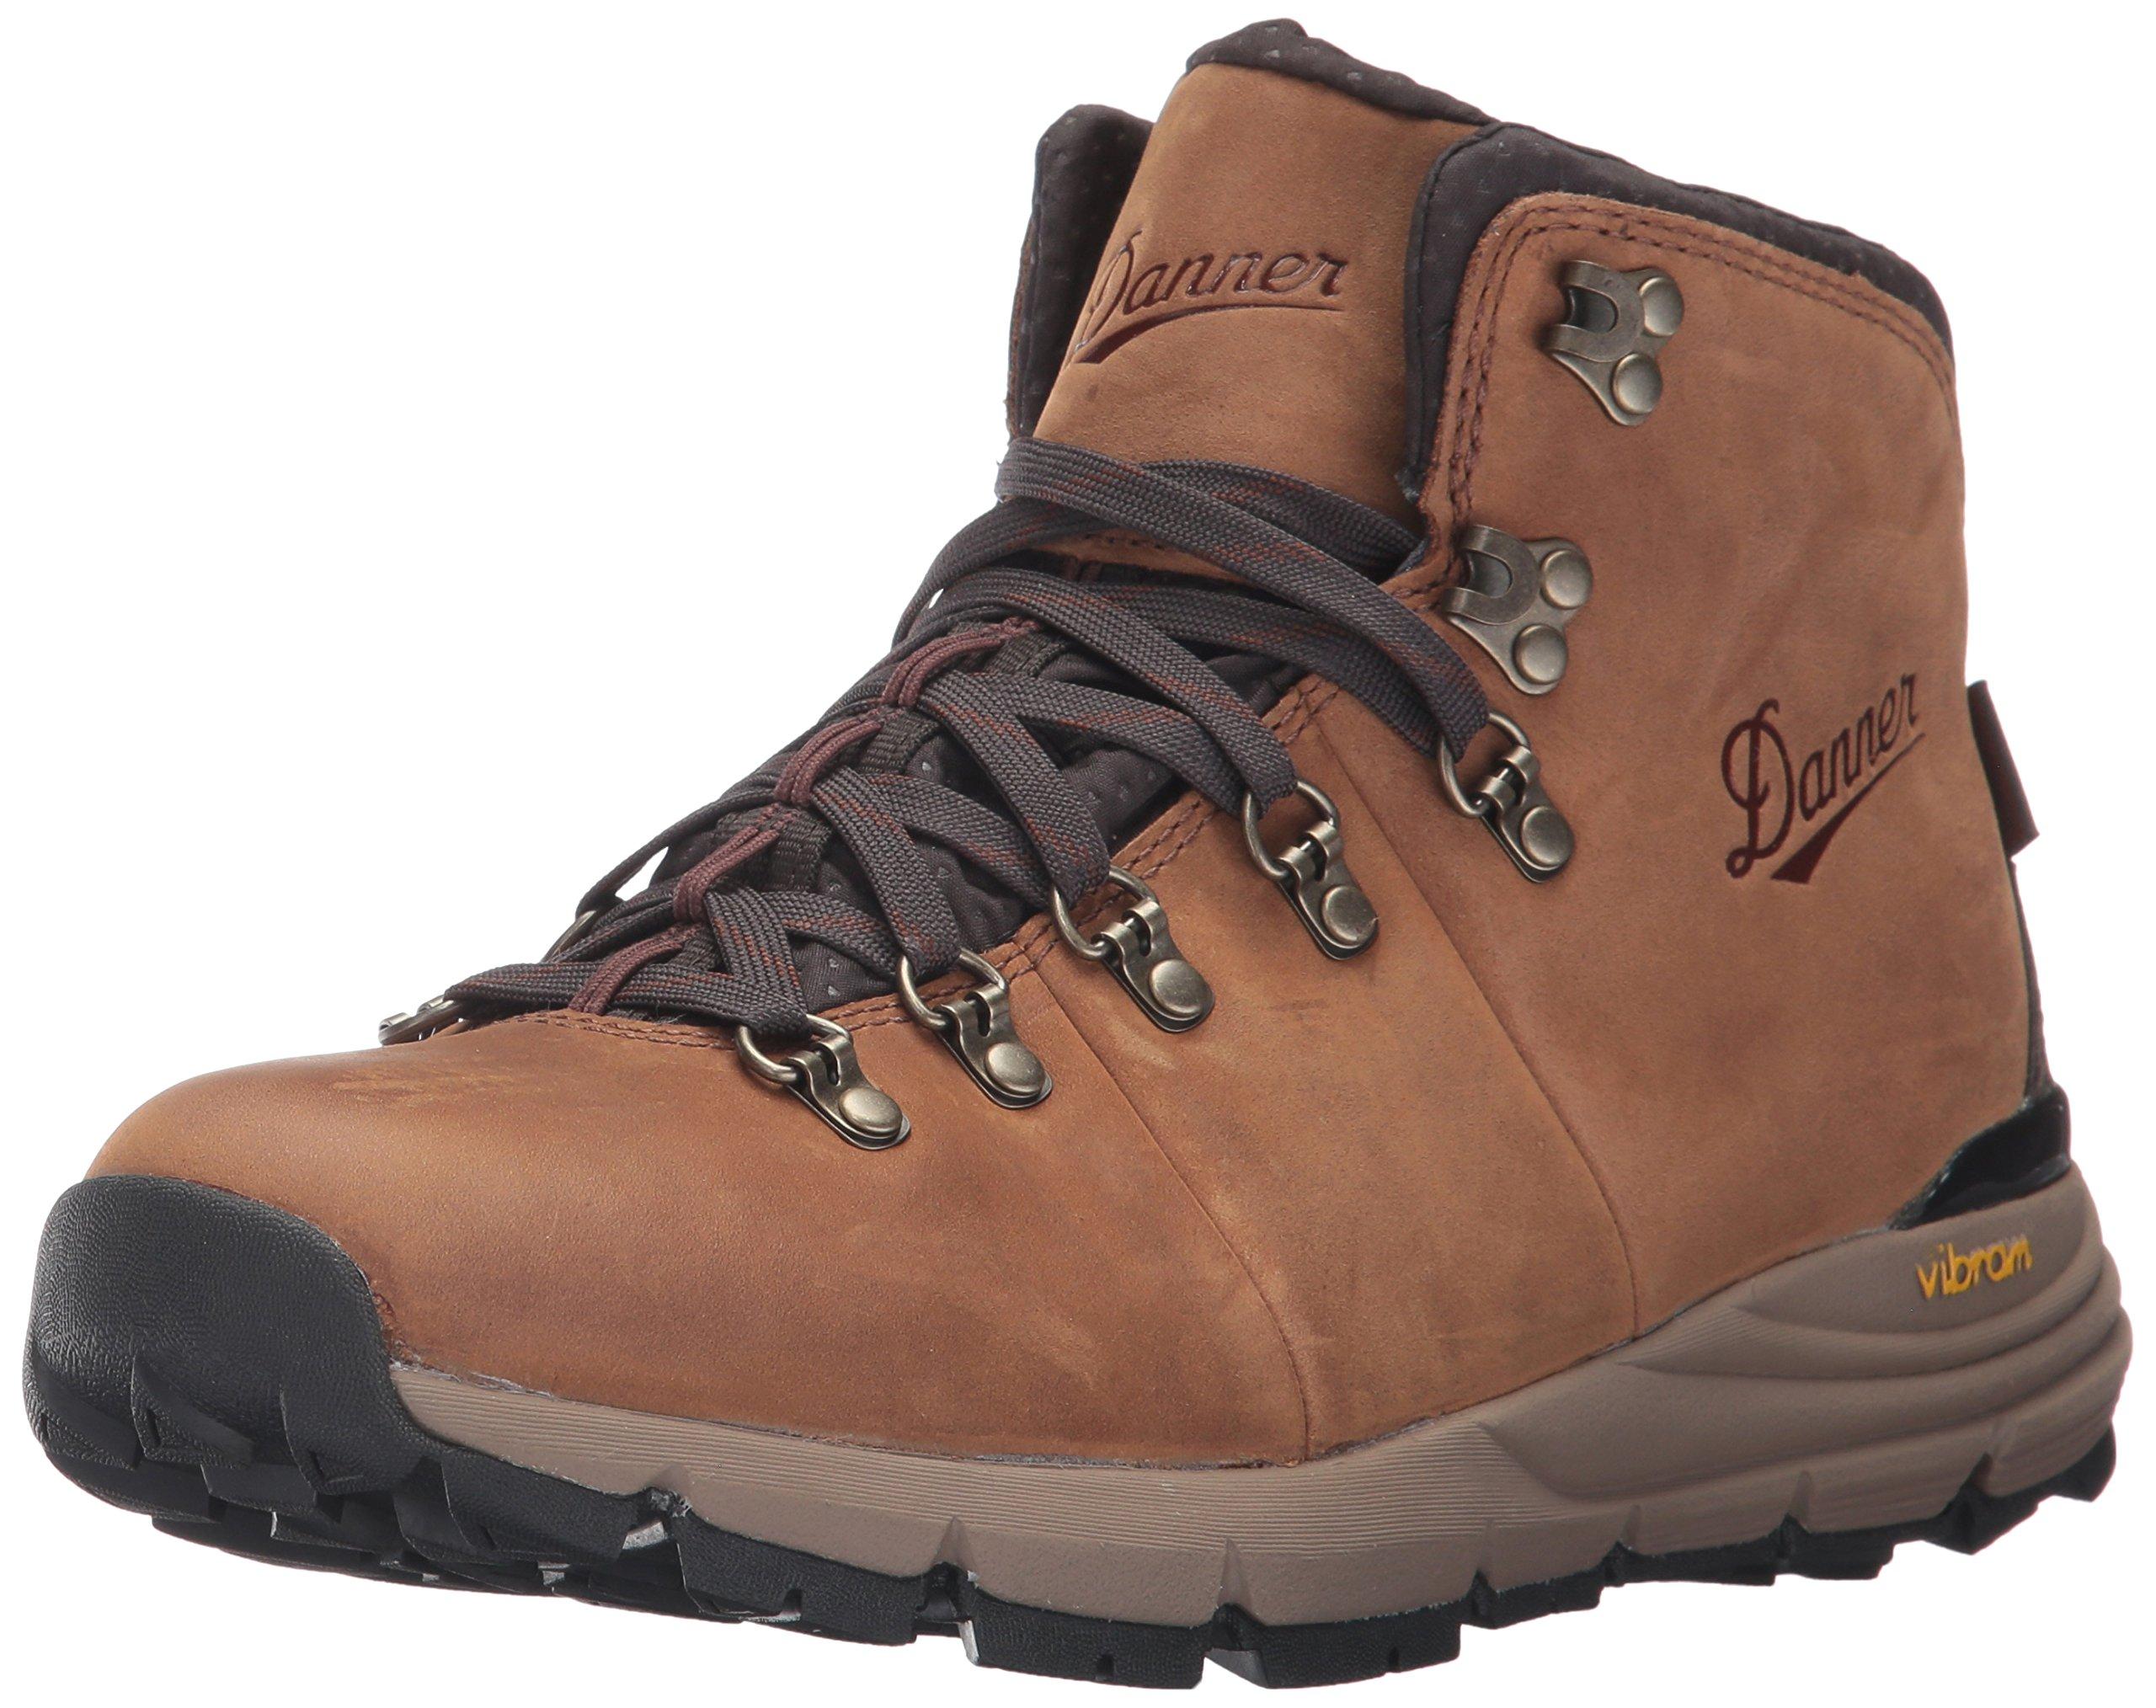 Danner Men's Mountain 600 Full Grain Hiking Boot, Rich Brown, 10 D US